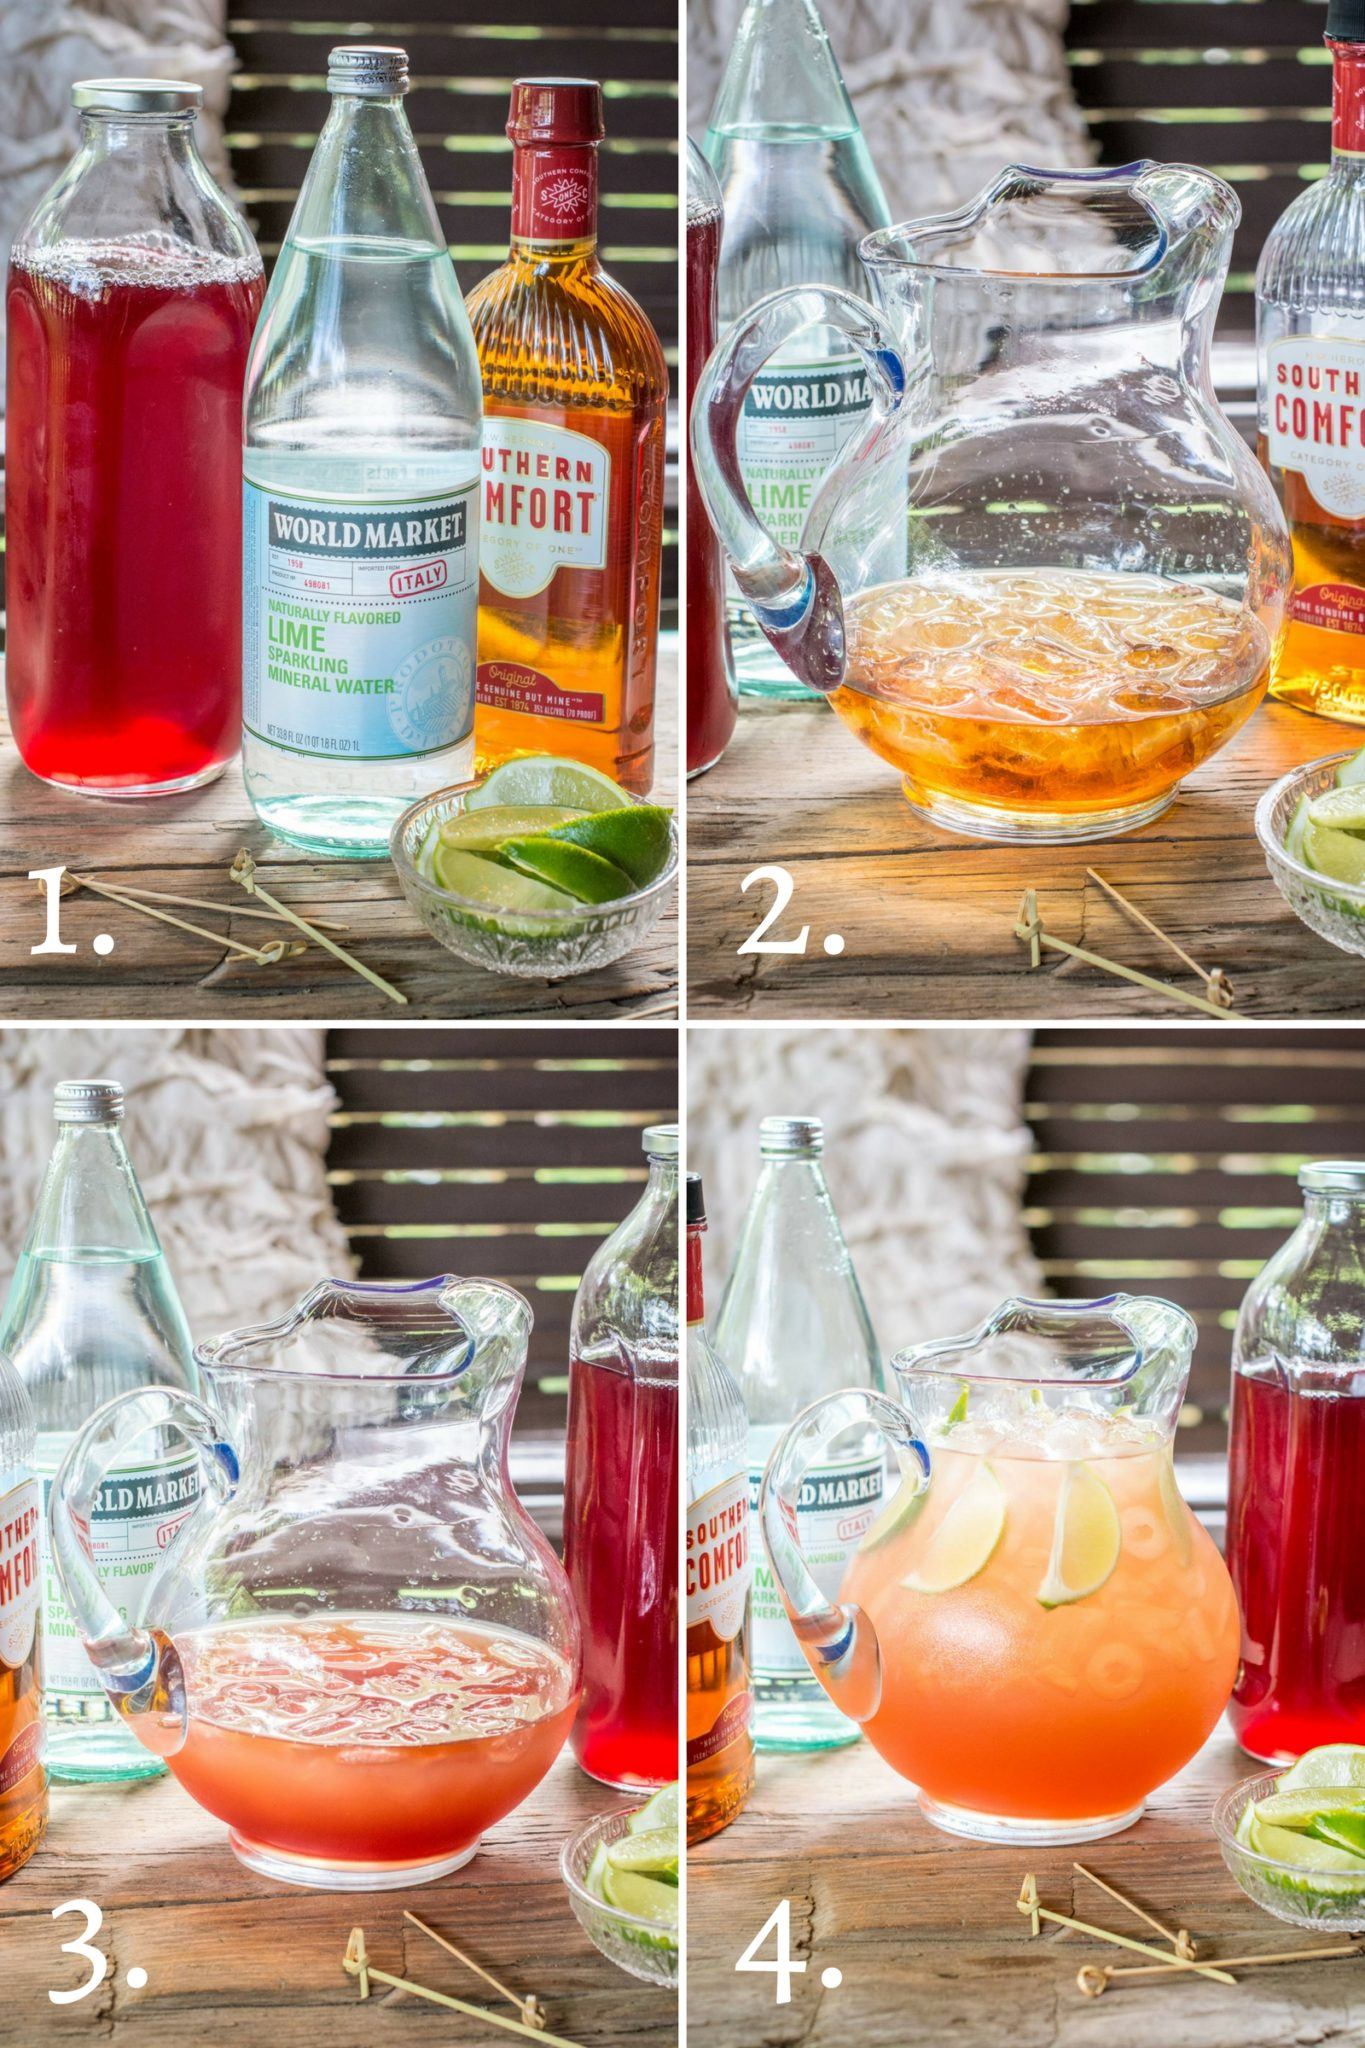 Mixing a Scarlet O'Hara Cocktail Punch! @WorldMarket #WorldMarketCMA #ad